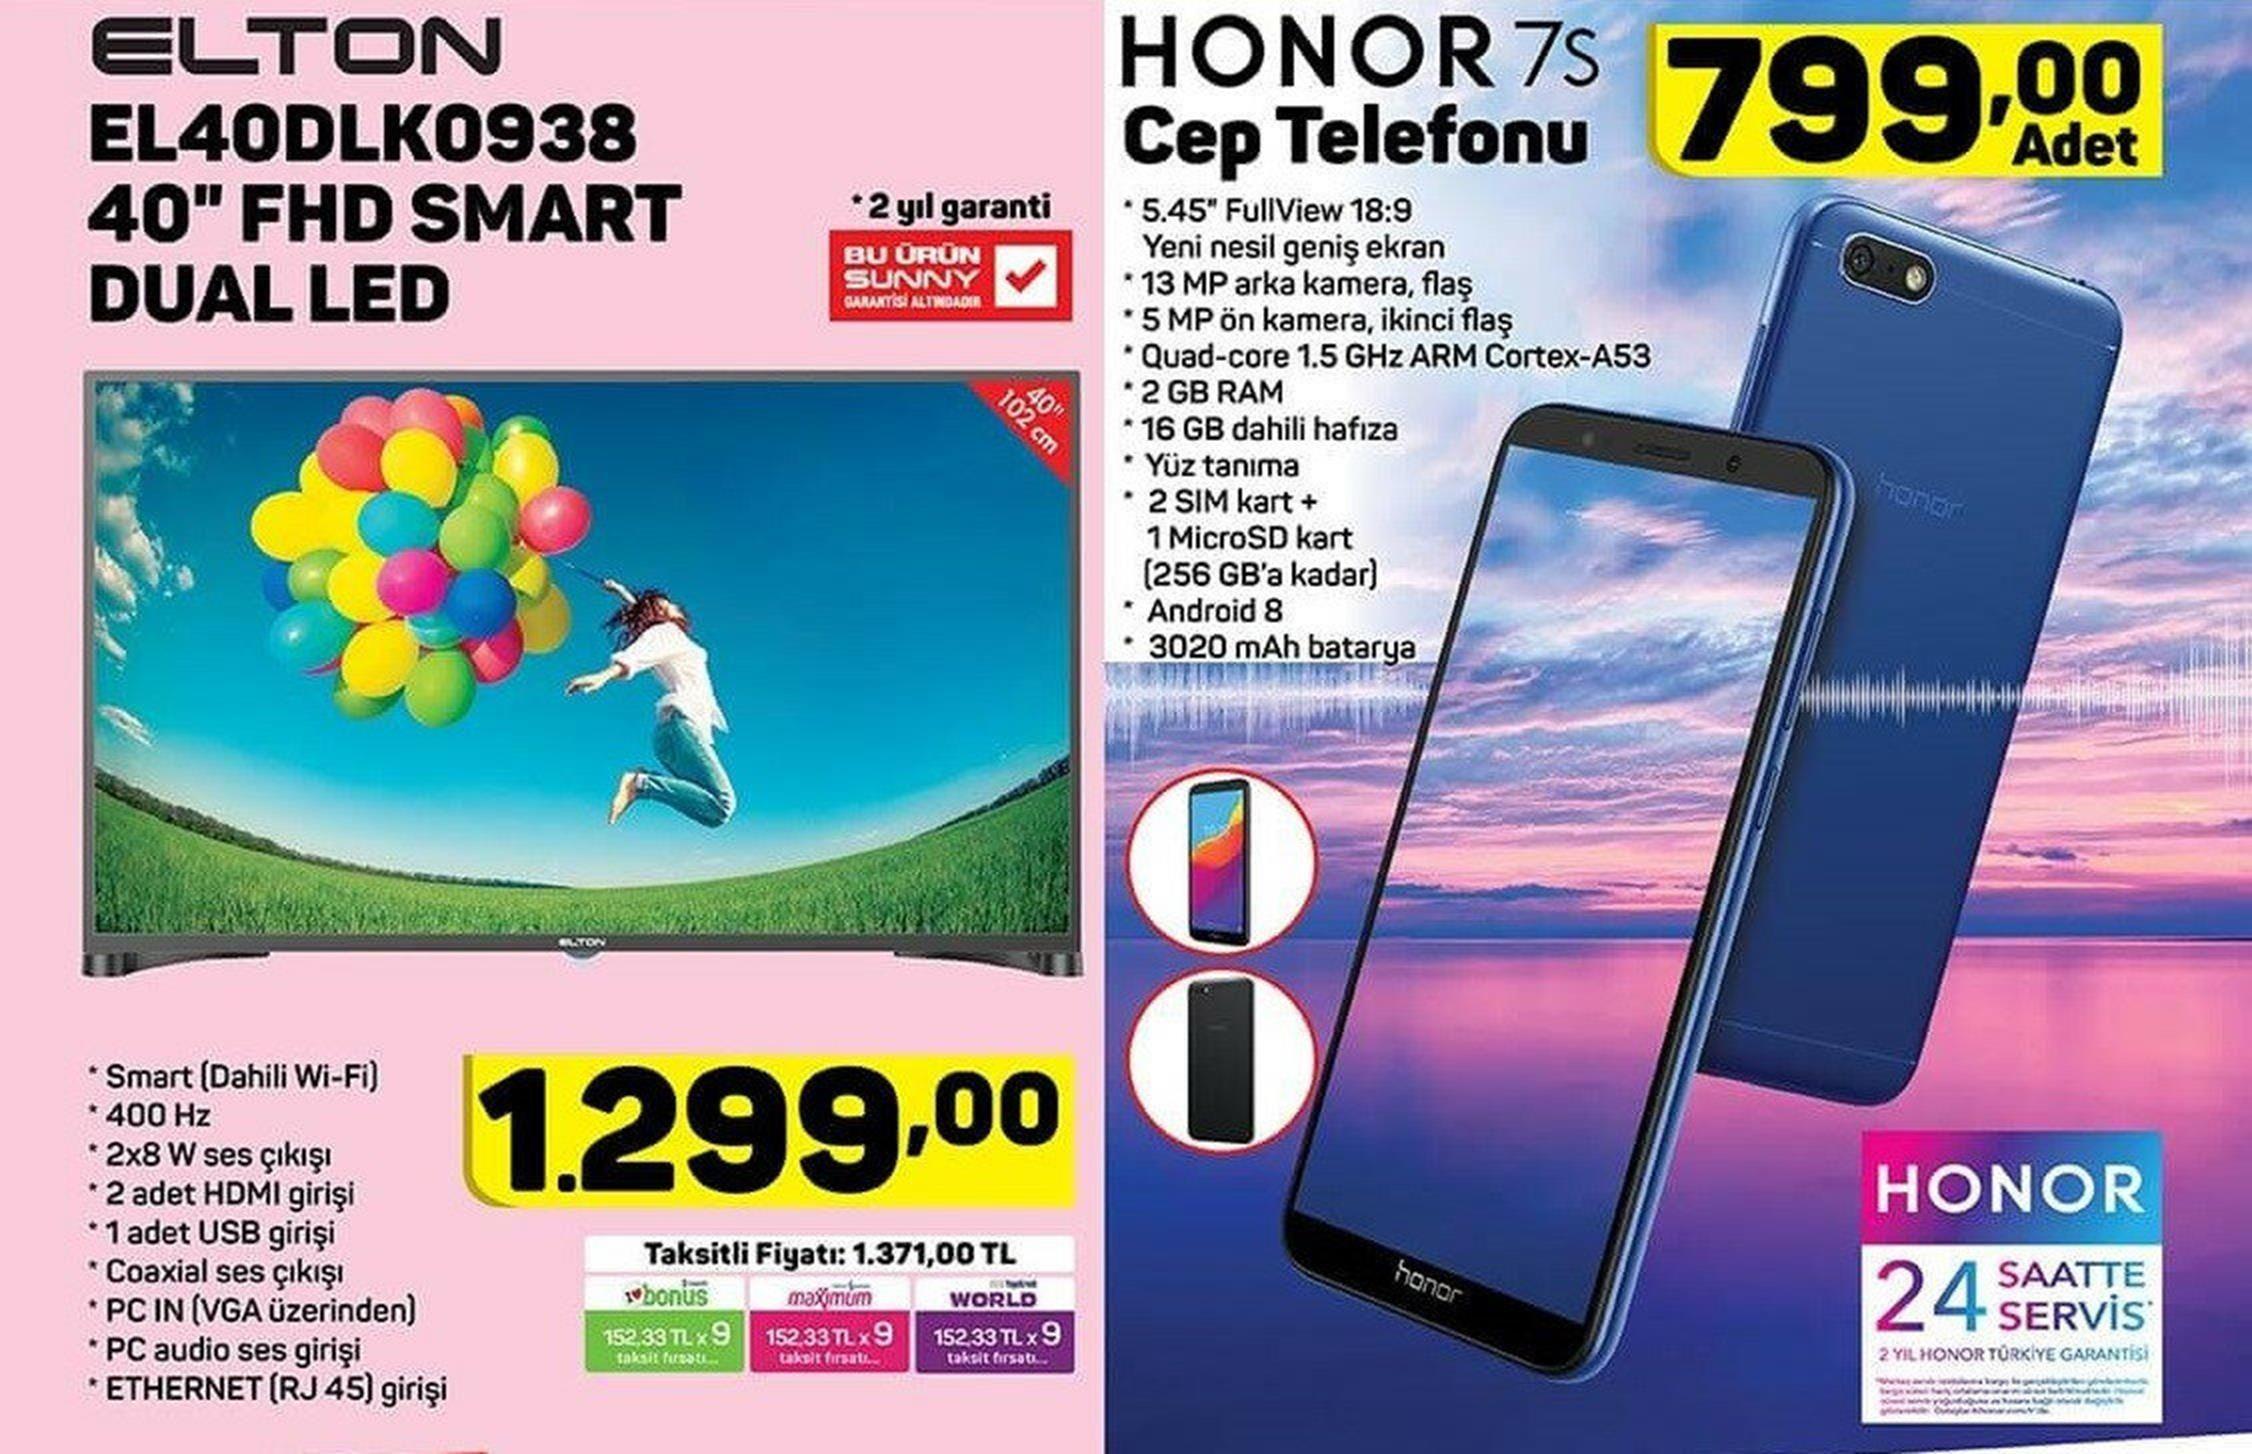 A101 Aktuel Urunler Gelecek A101 Katalogu In 2020 Electronic Products Phone Electronics